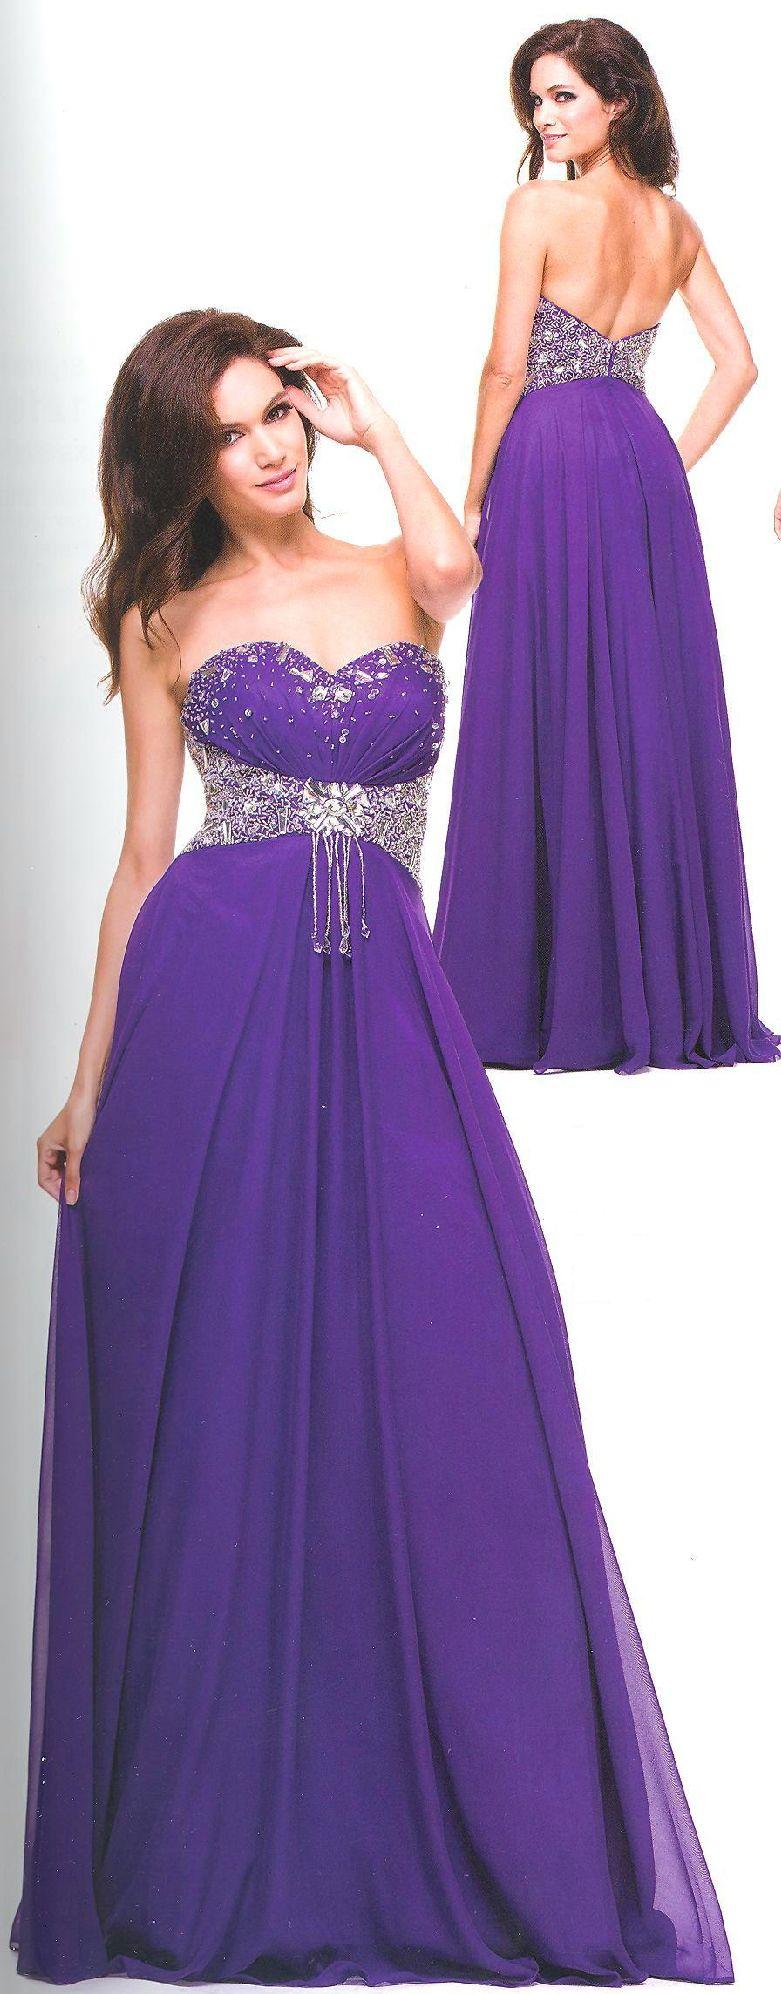 Prom dresswinter ball dress under irresistible beautynew